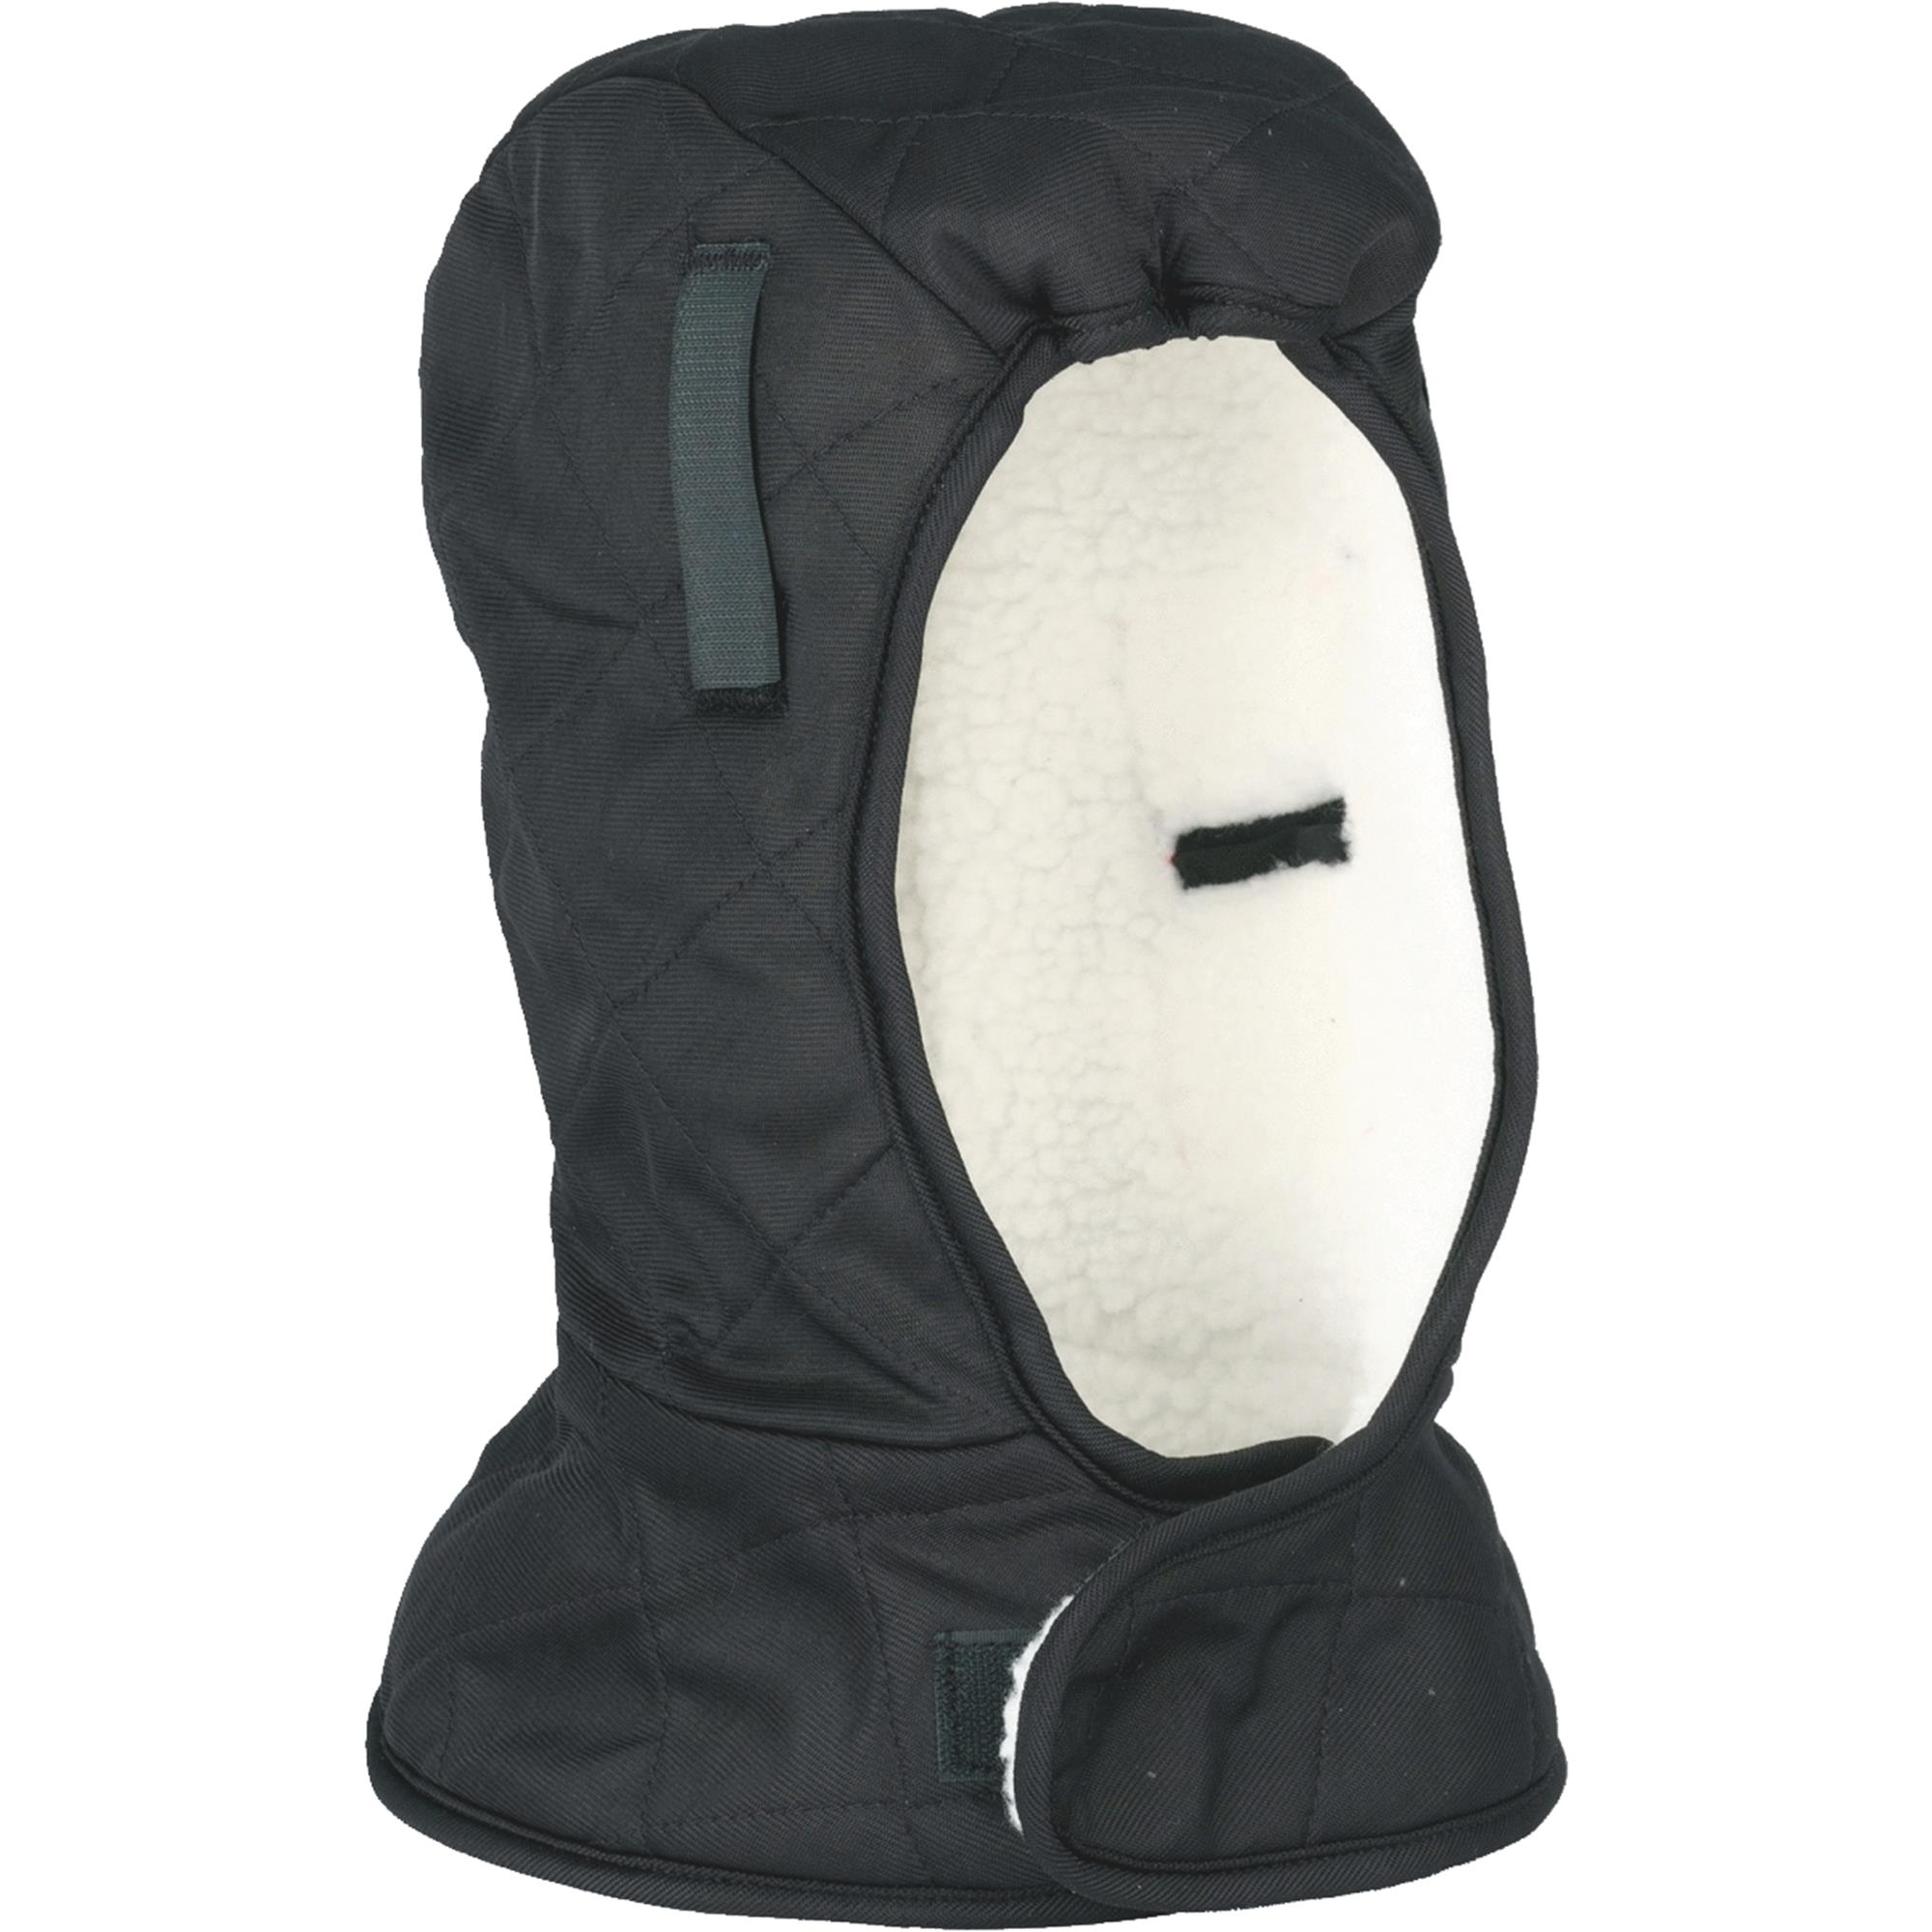 Ergodyne N-Ferno Fleece Facemask